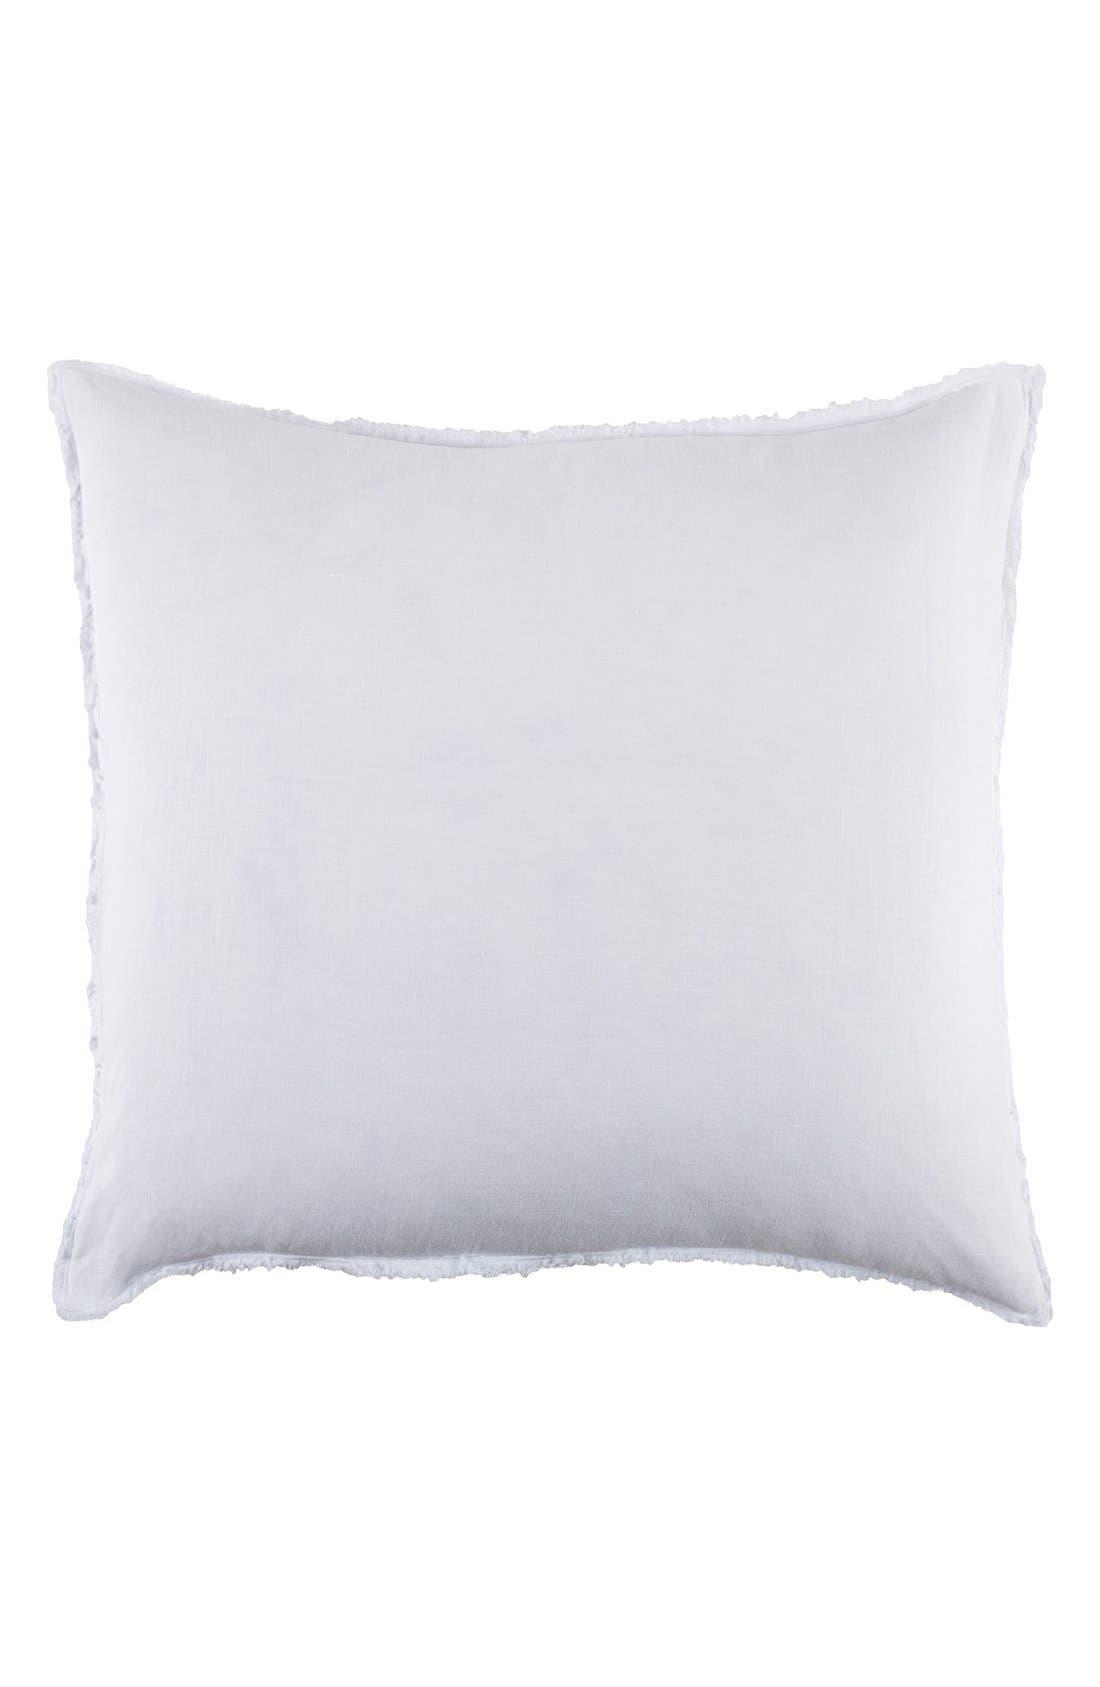 'Blair' Linen Euro Pillow Sham, Main, color, WHITE